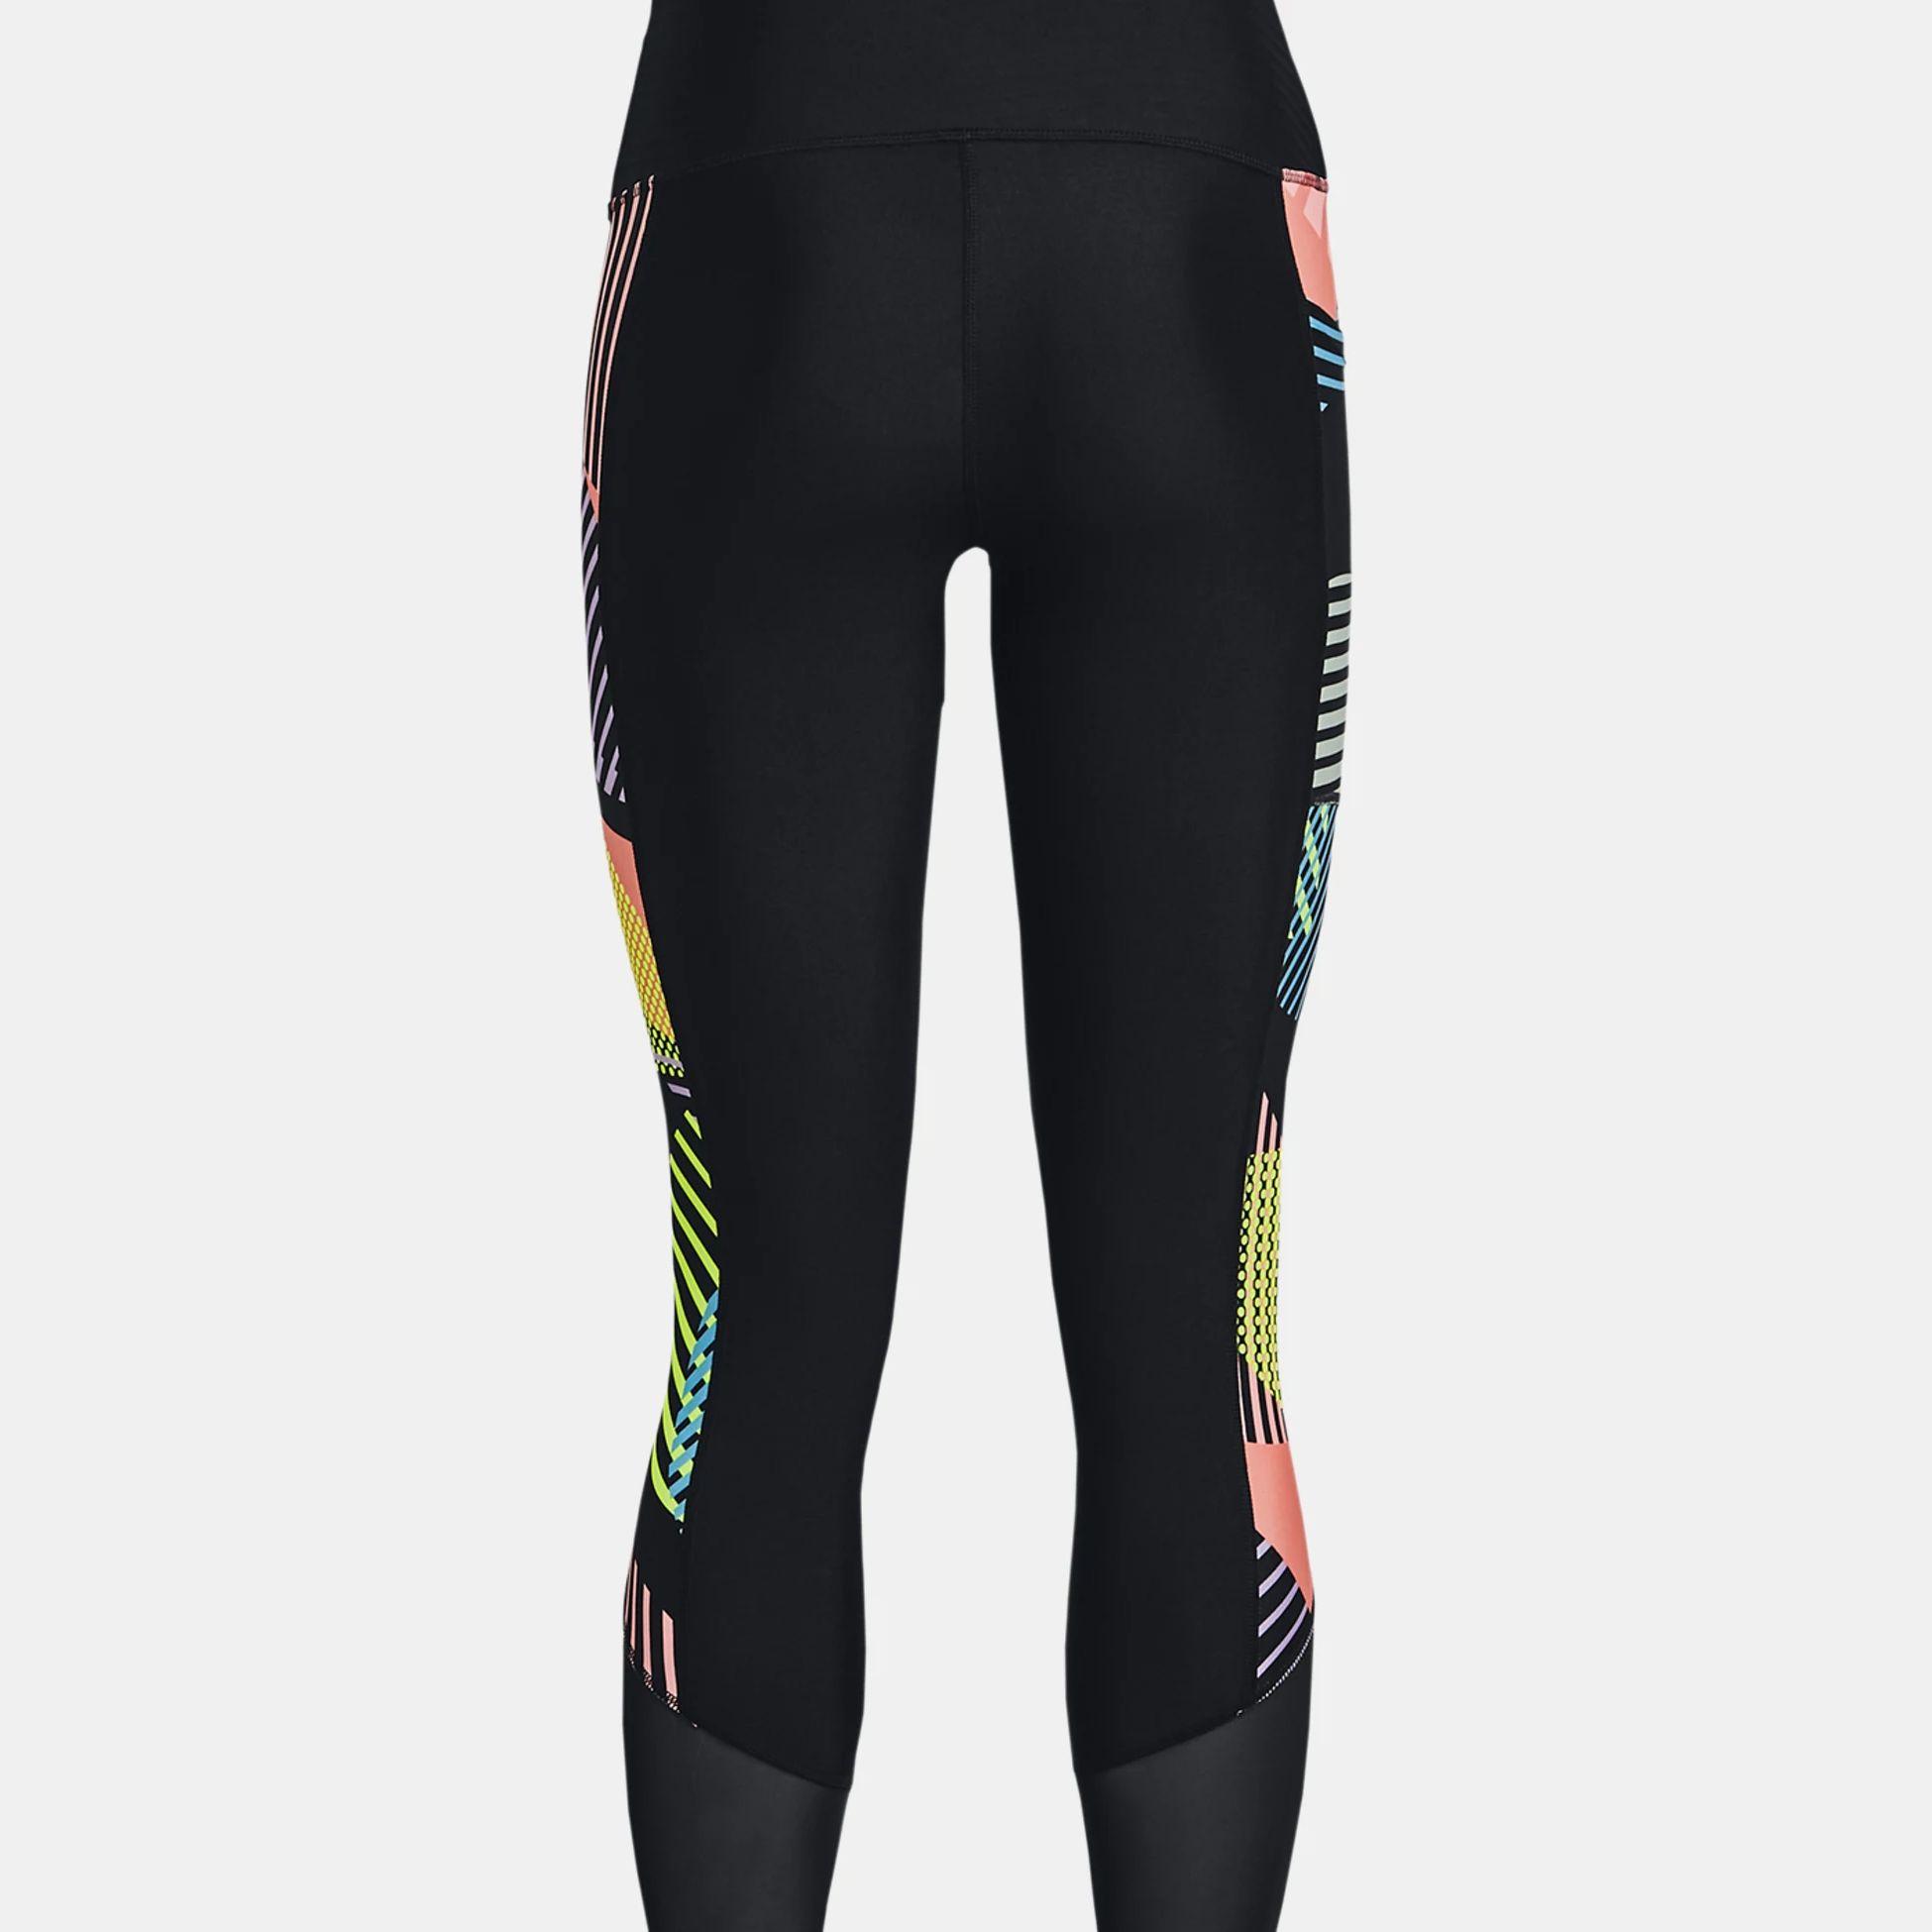 Îmbrăcăminte -  under armour HeatGear Armour No-Slip Waistband Geo Ankle Leggings